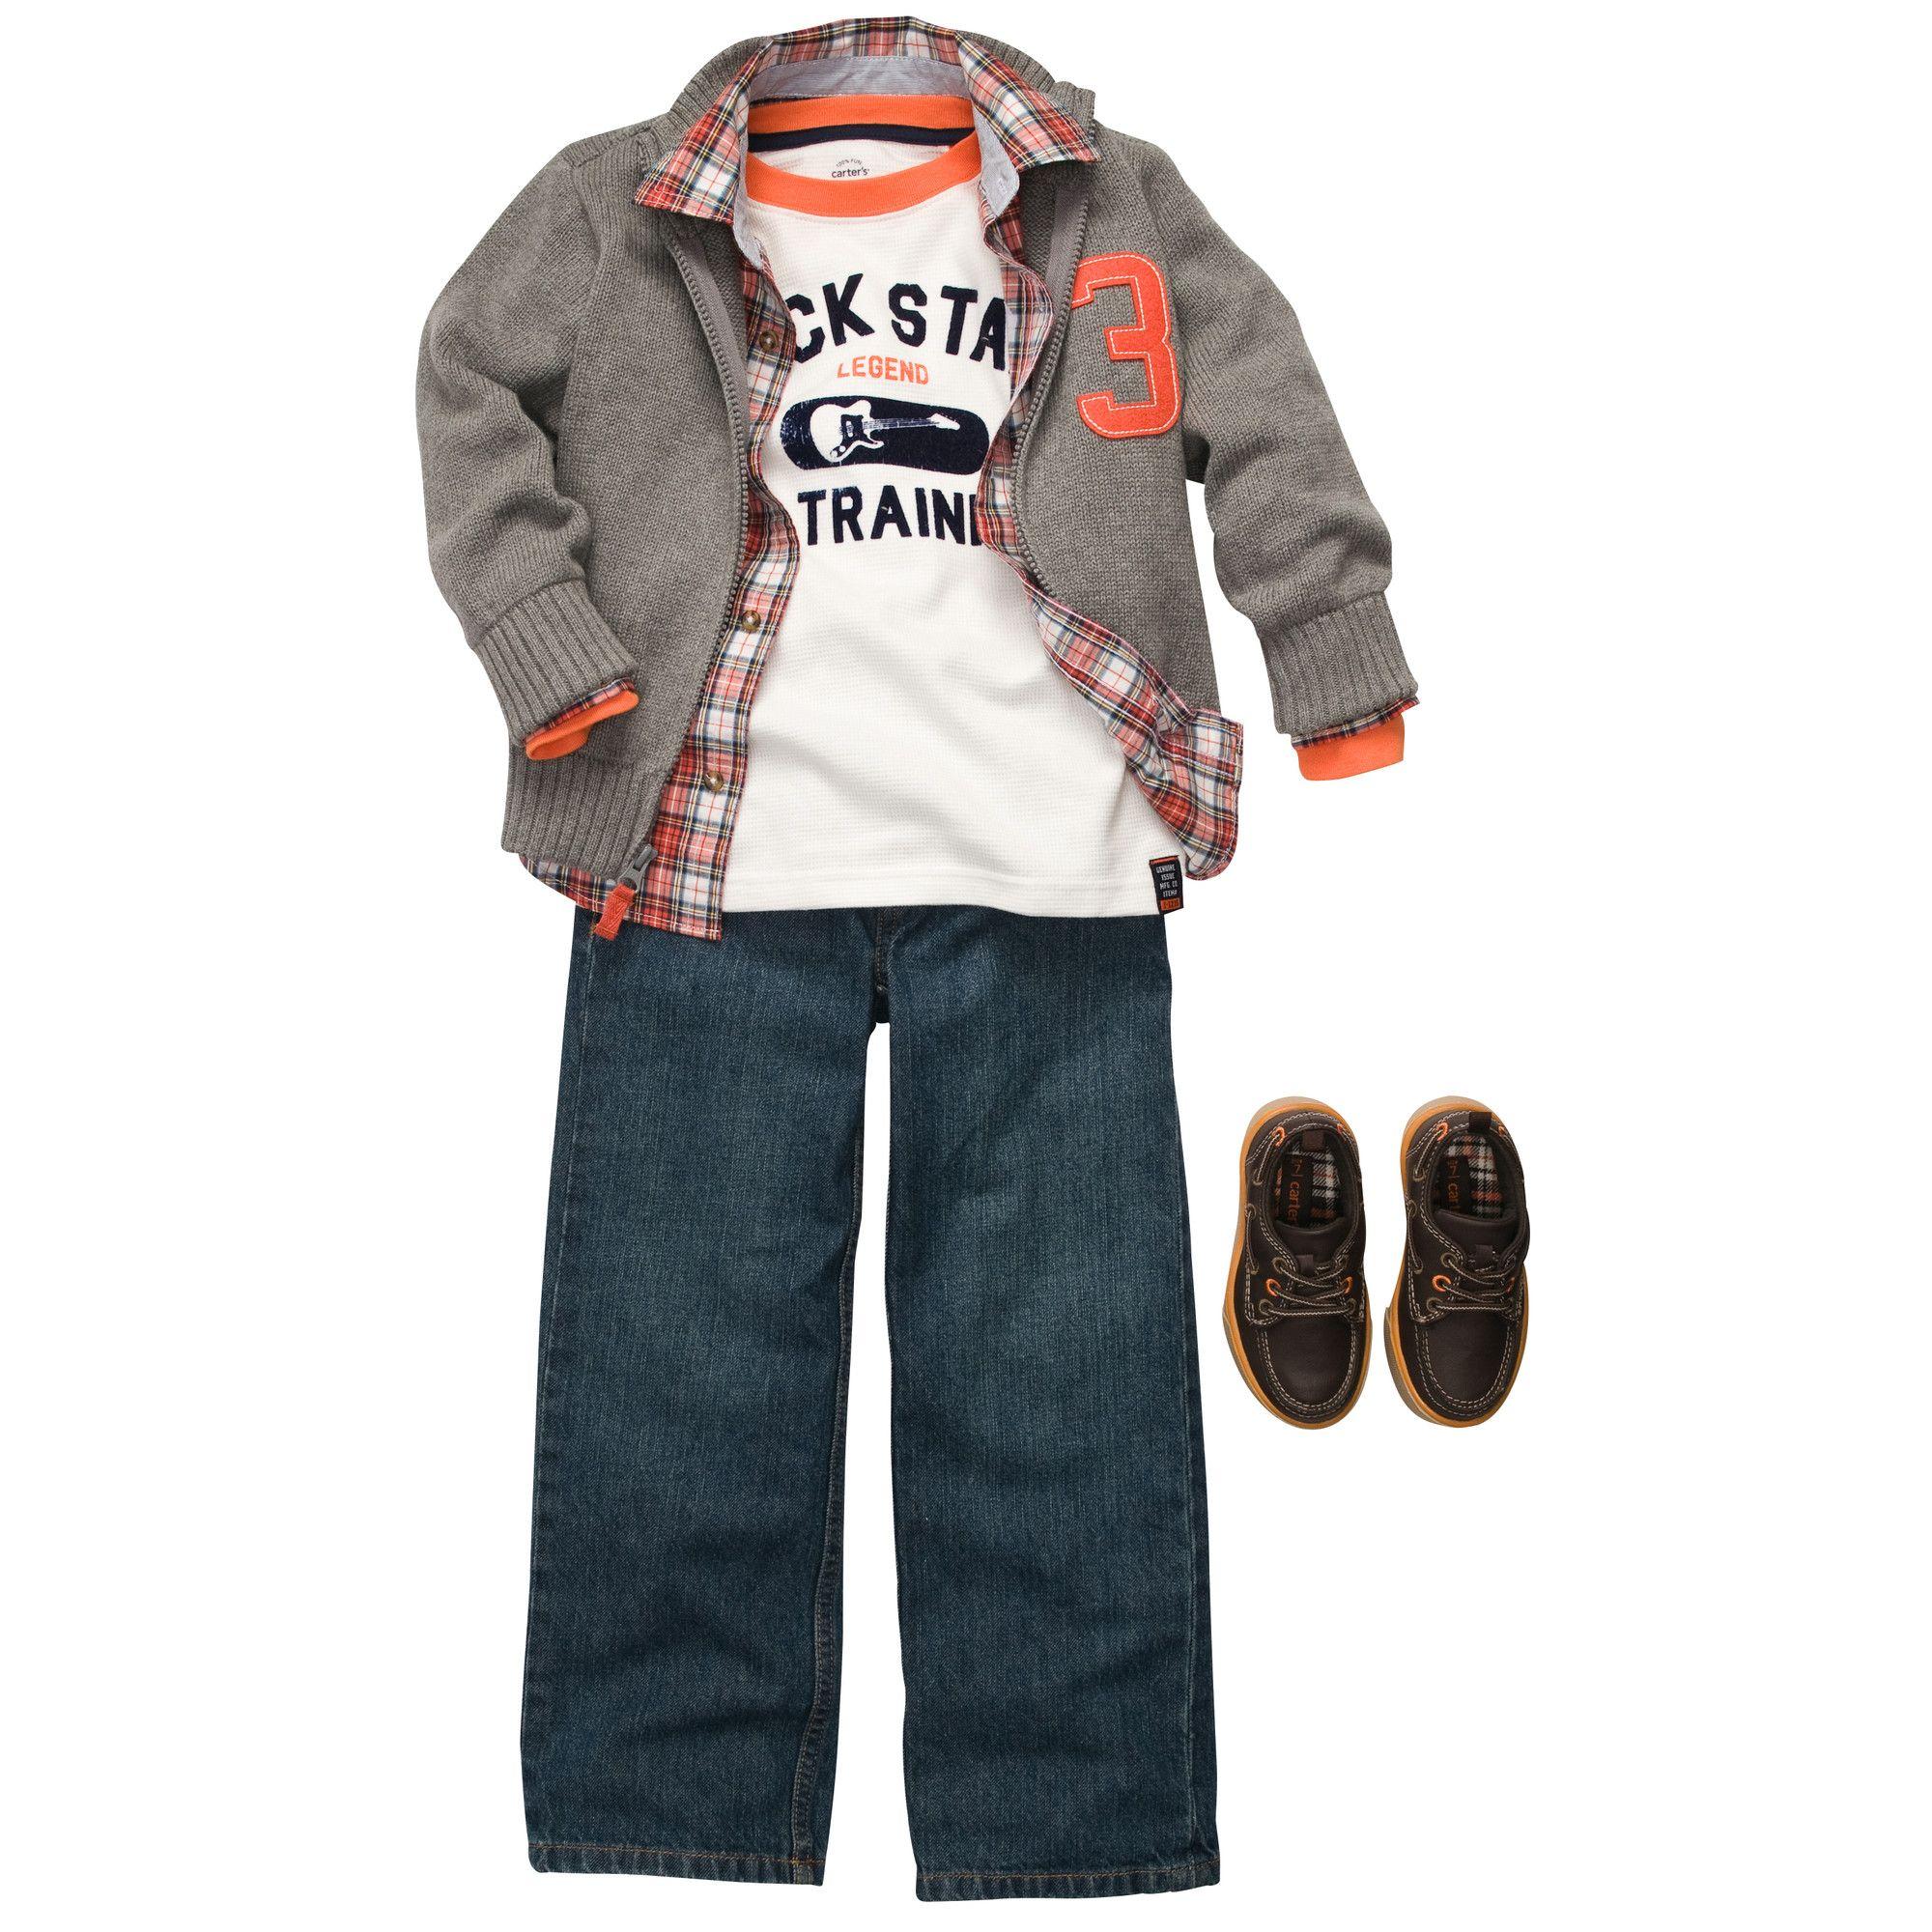 Boy clothes up dress pictures